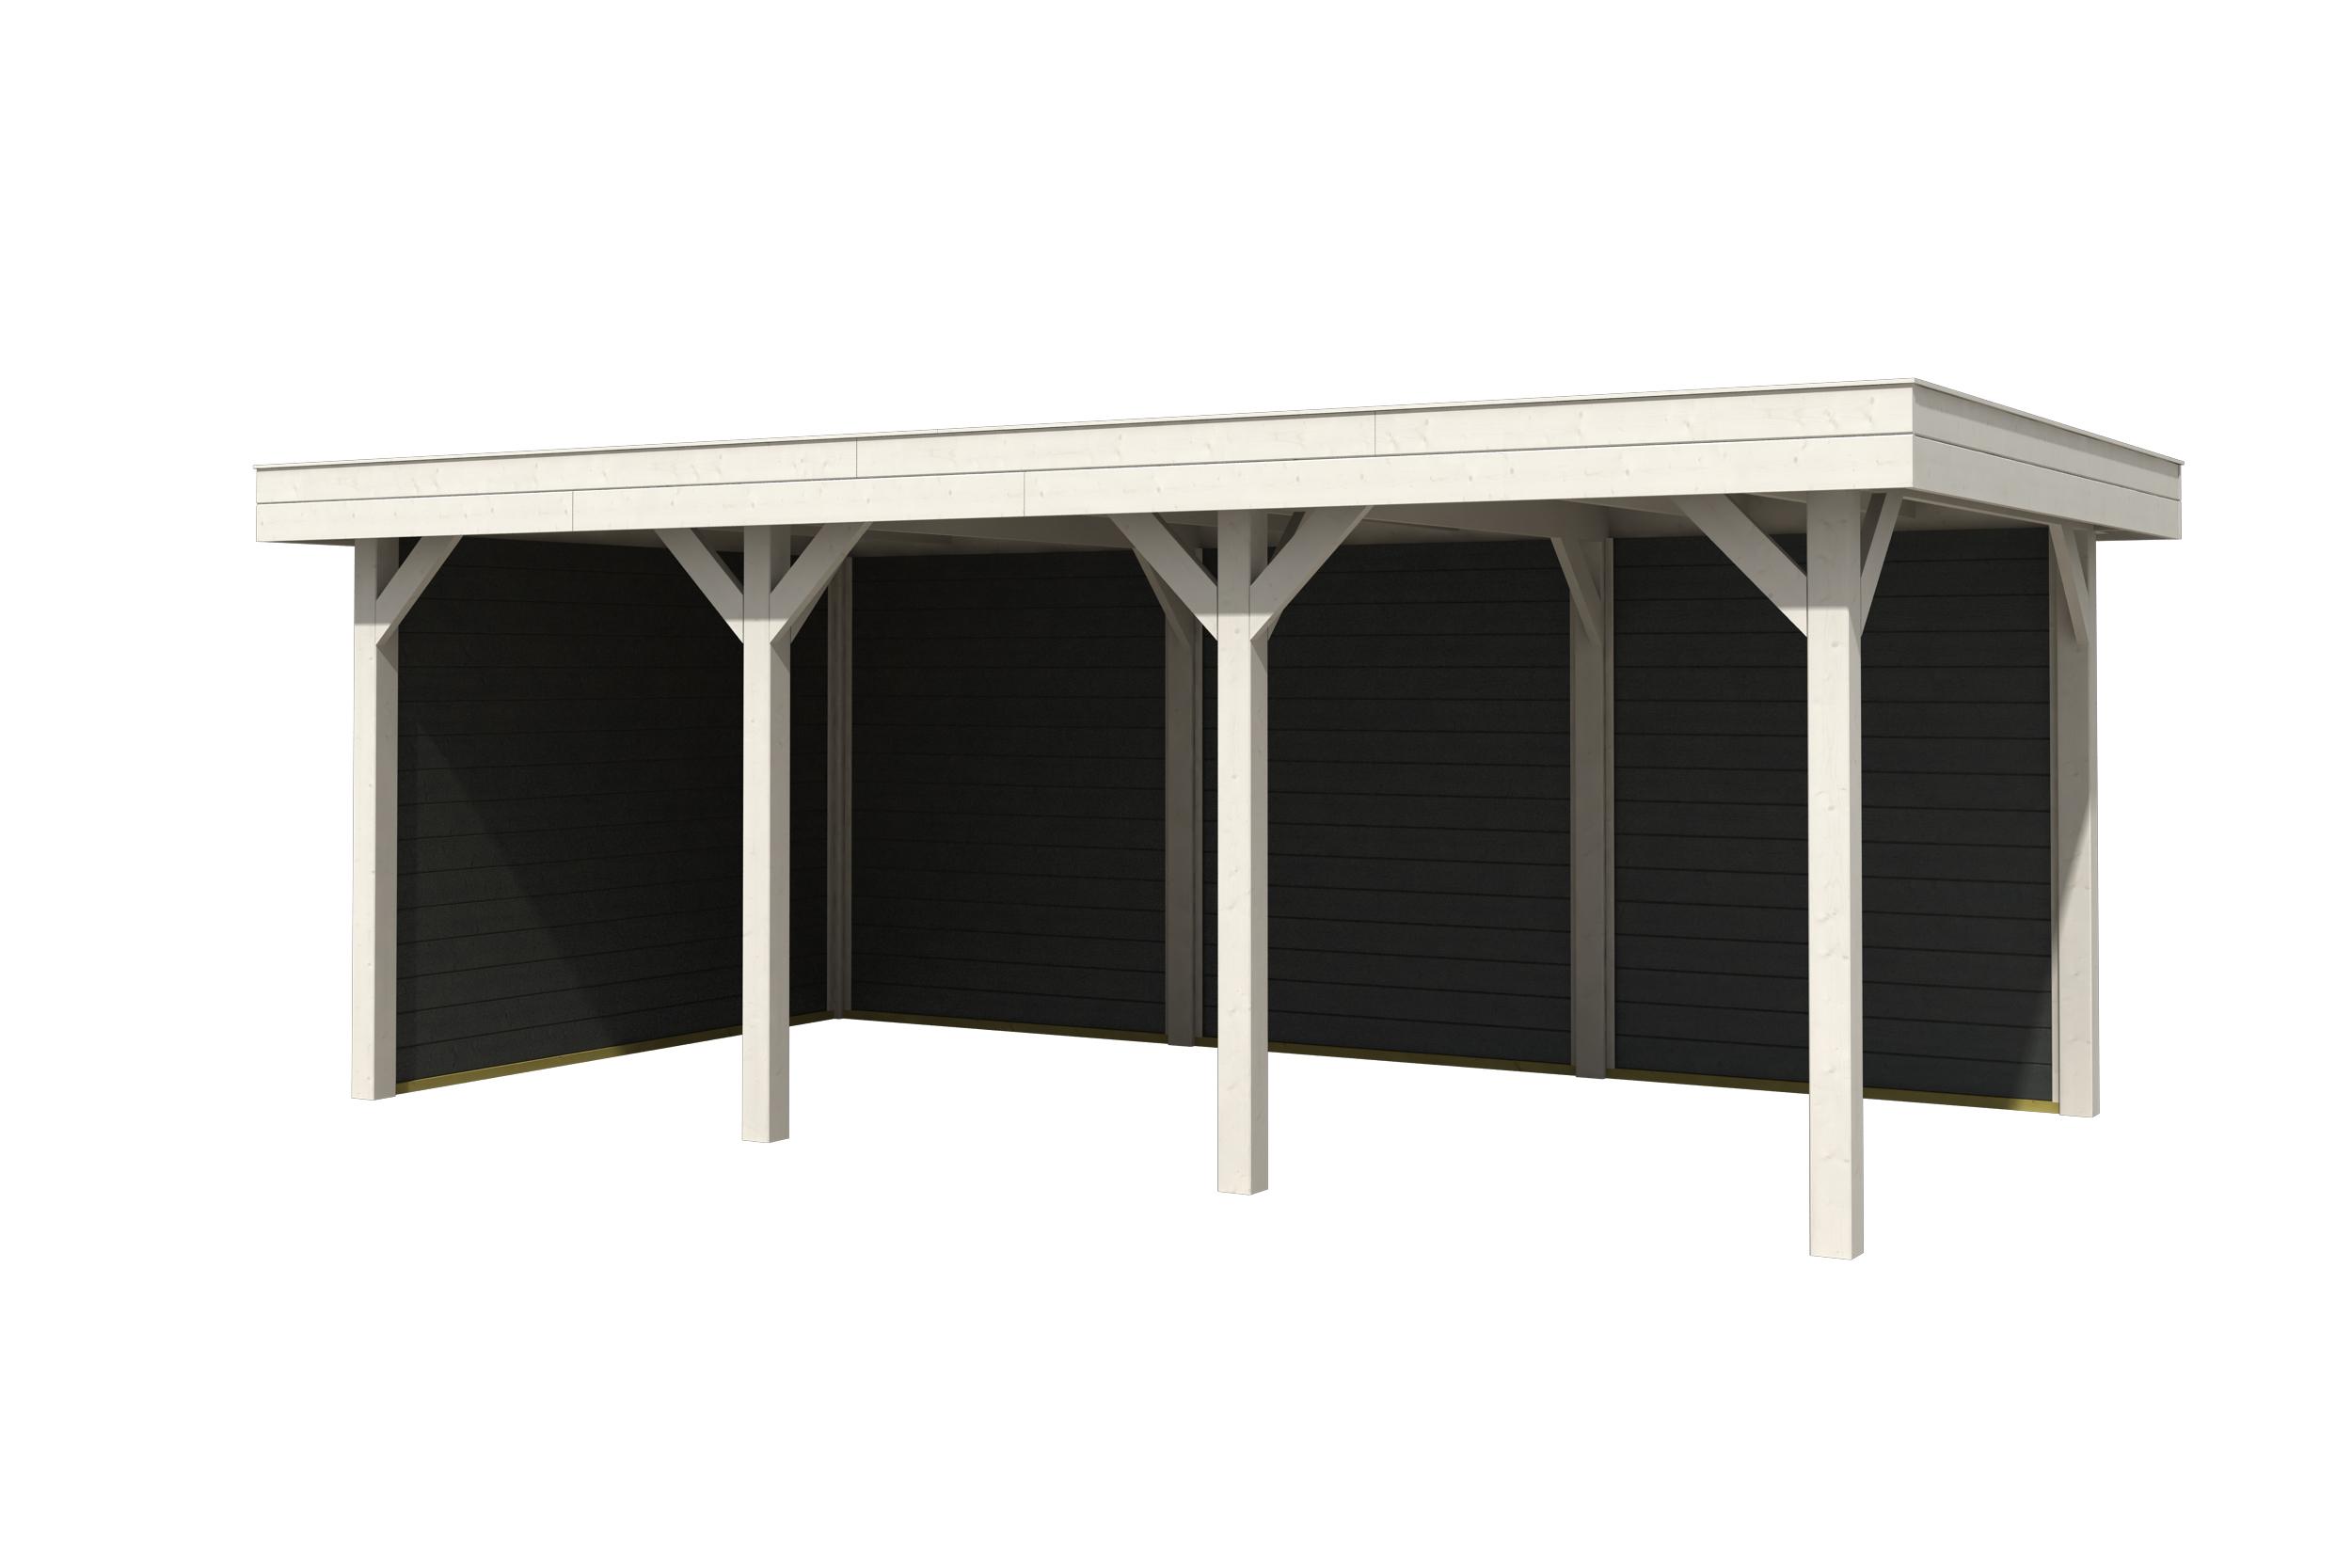 Westwood | Outdoor Living 6030 20 Plus | Carbon Grey | 588x304 cm